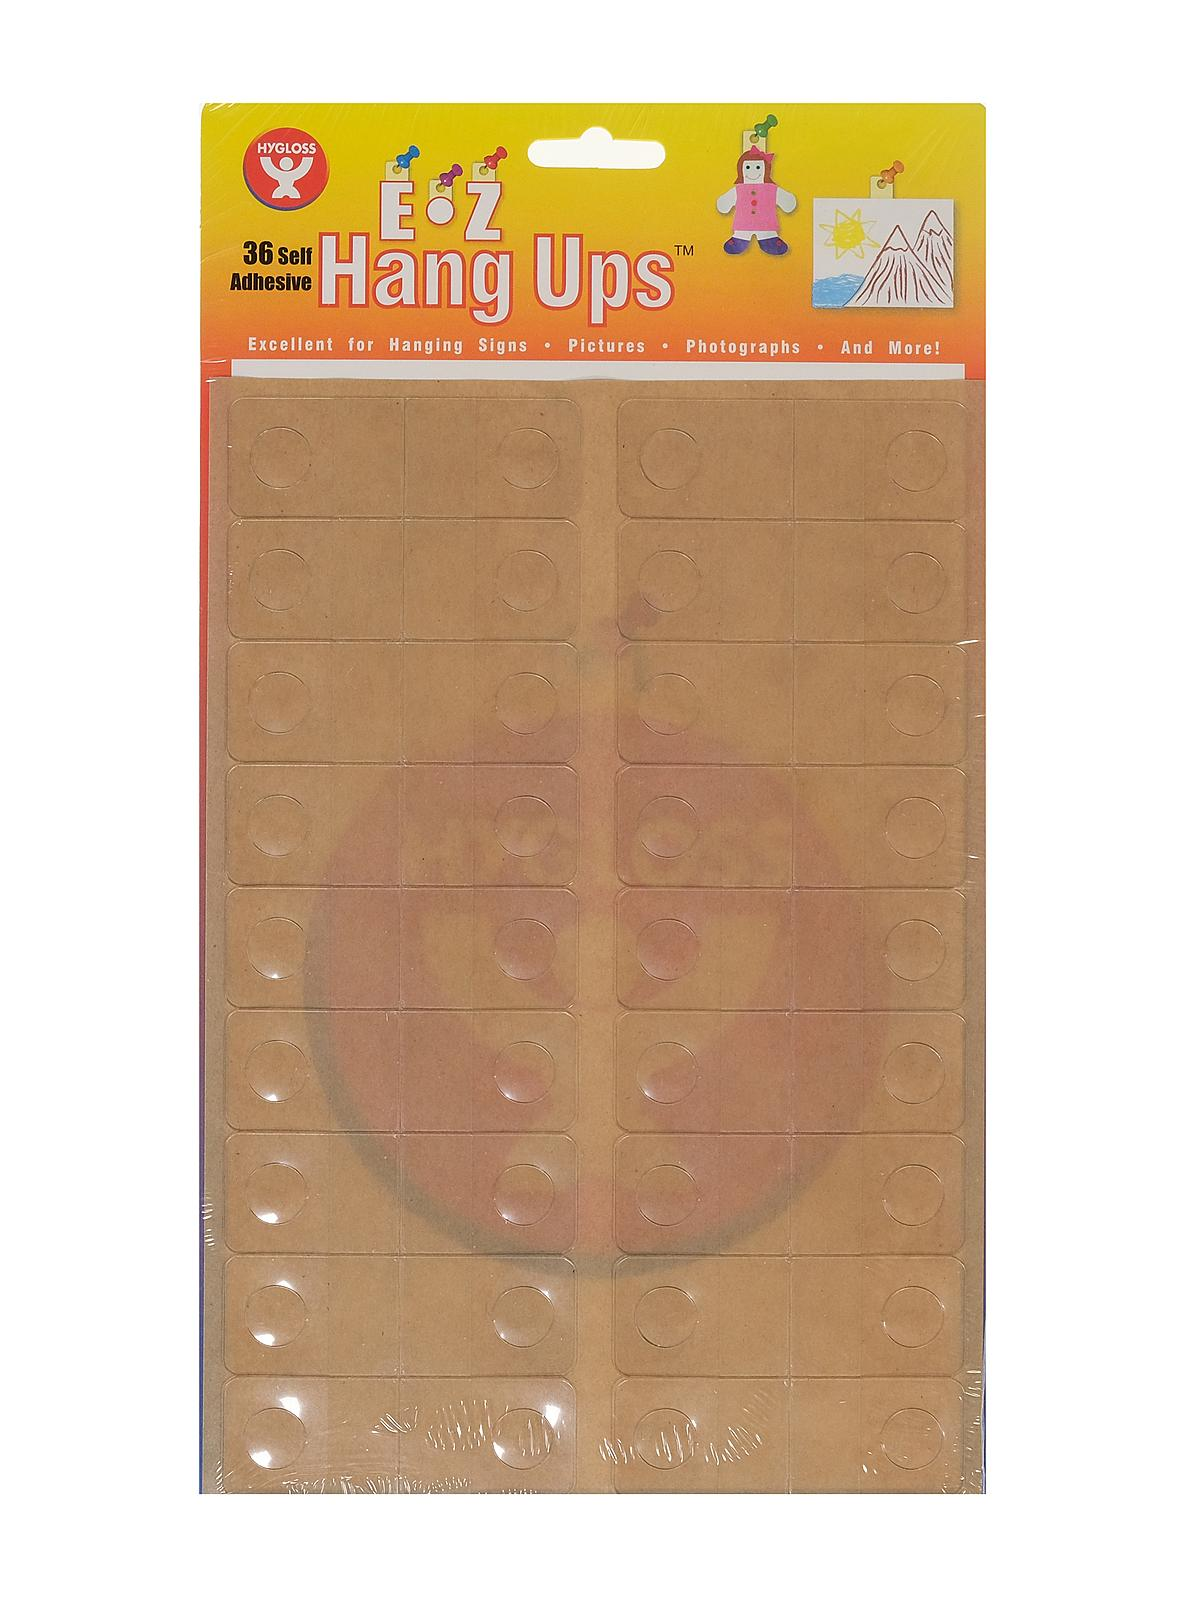 Self-Adhesive Hang-Ups